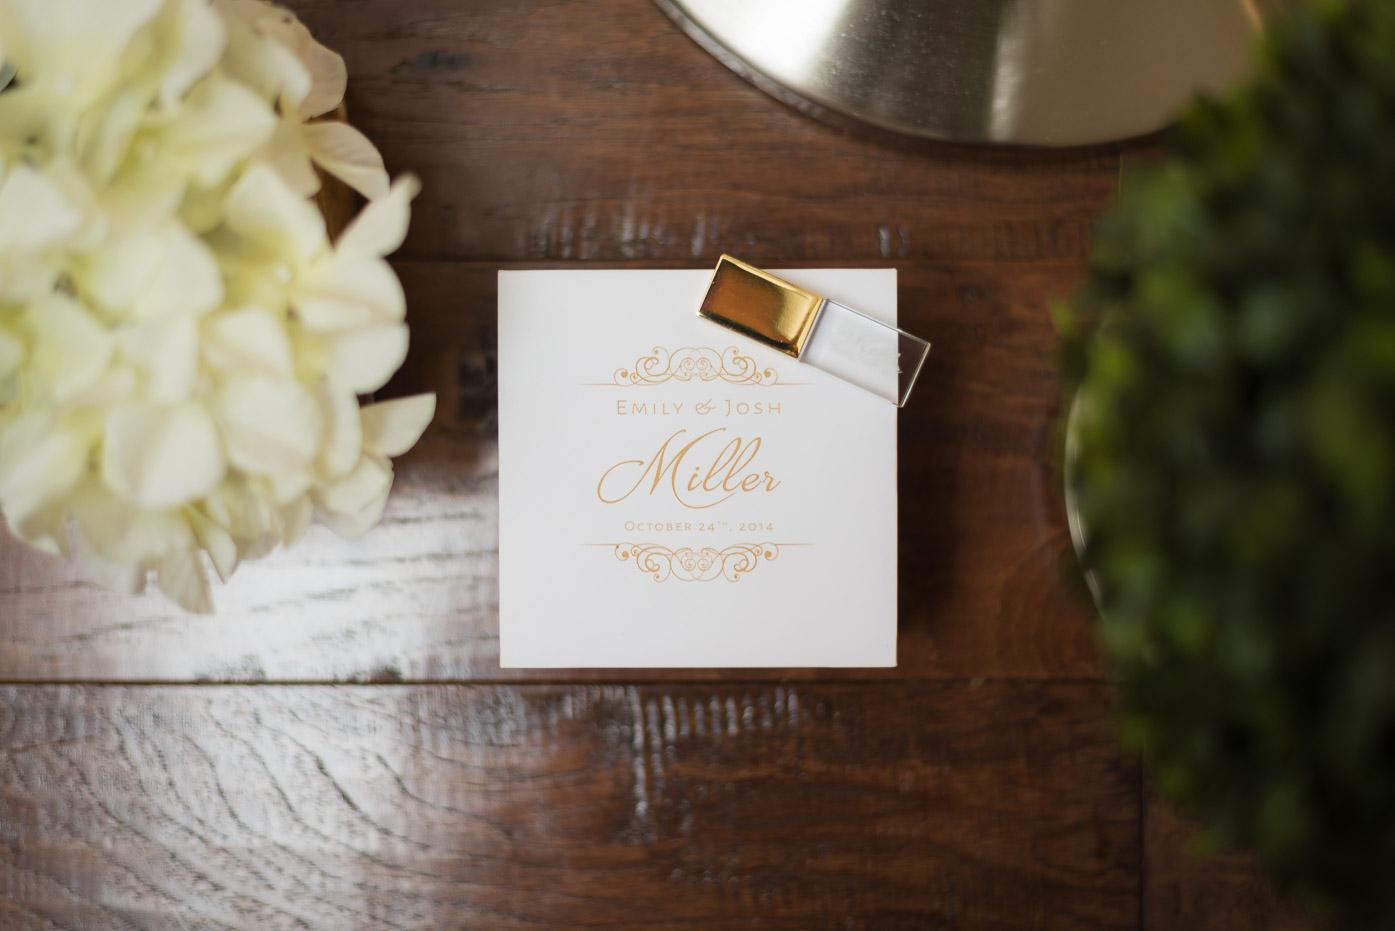 Crystal USB Storage Drive Wedding Photos-1.jpg